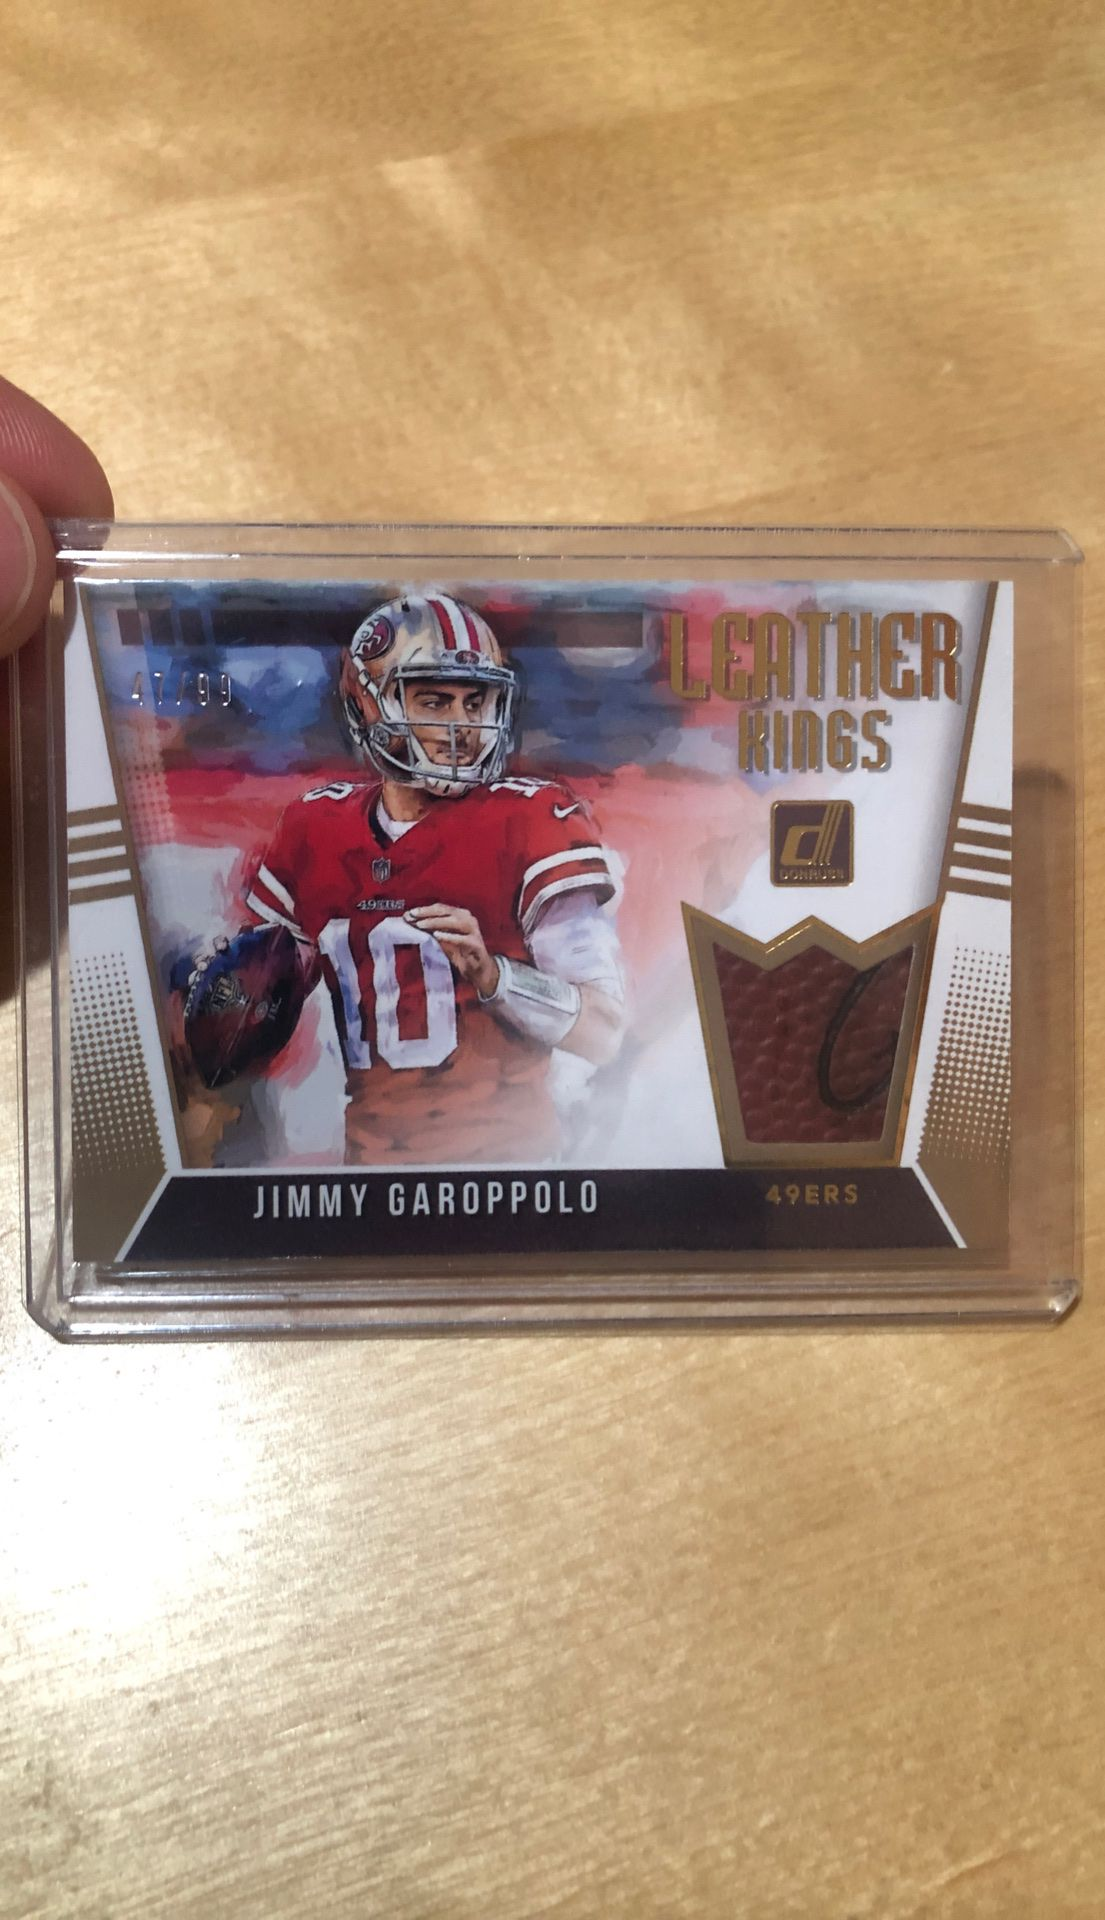 Jimmy Garoppolo card